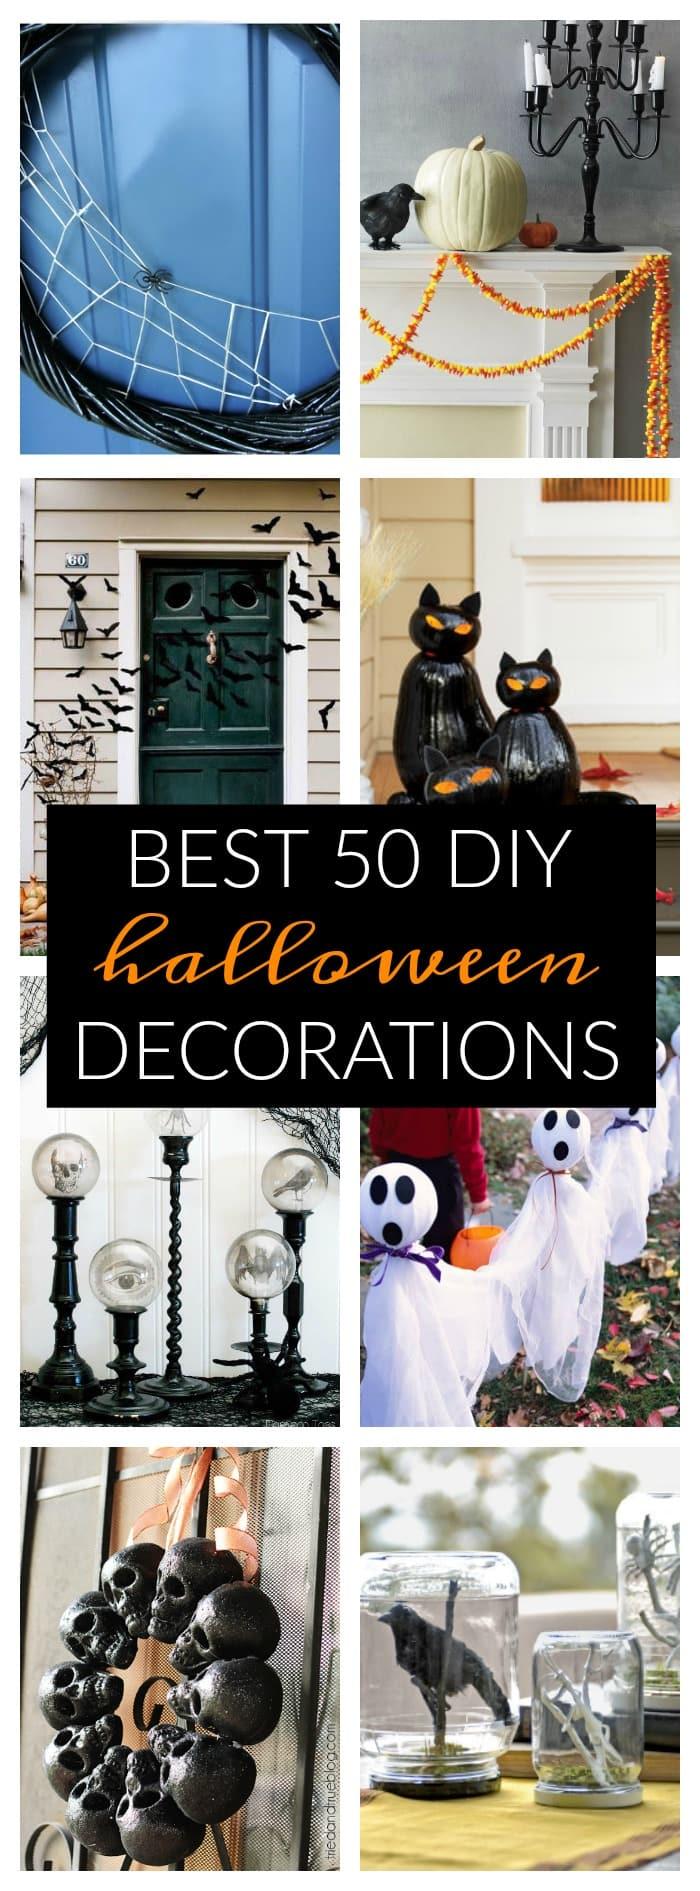 Best 50 DIY Halloween Decorations  A Dash of Sanity - Best Halloween Stuff